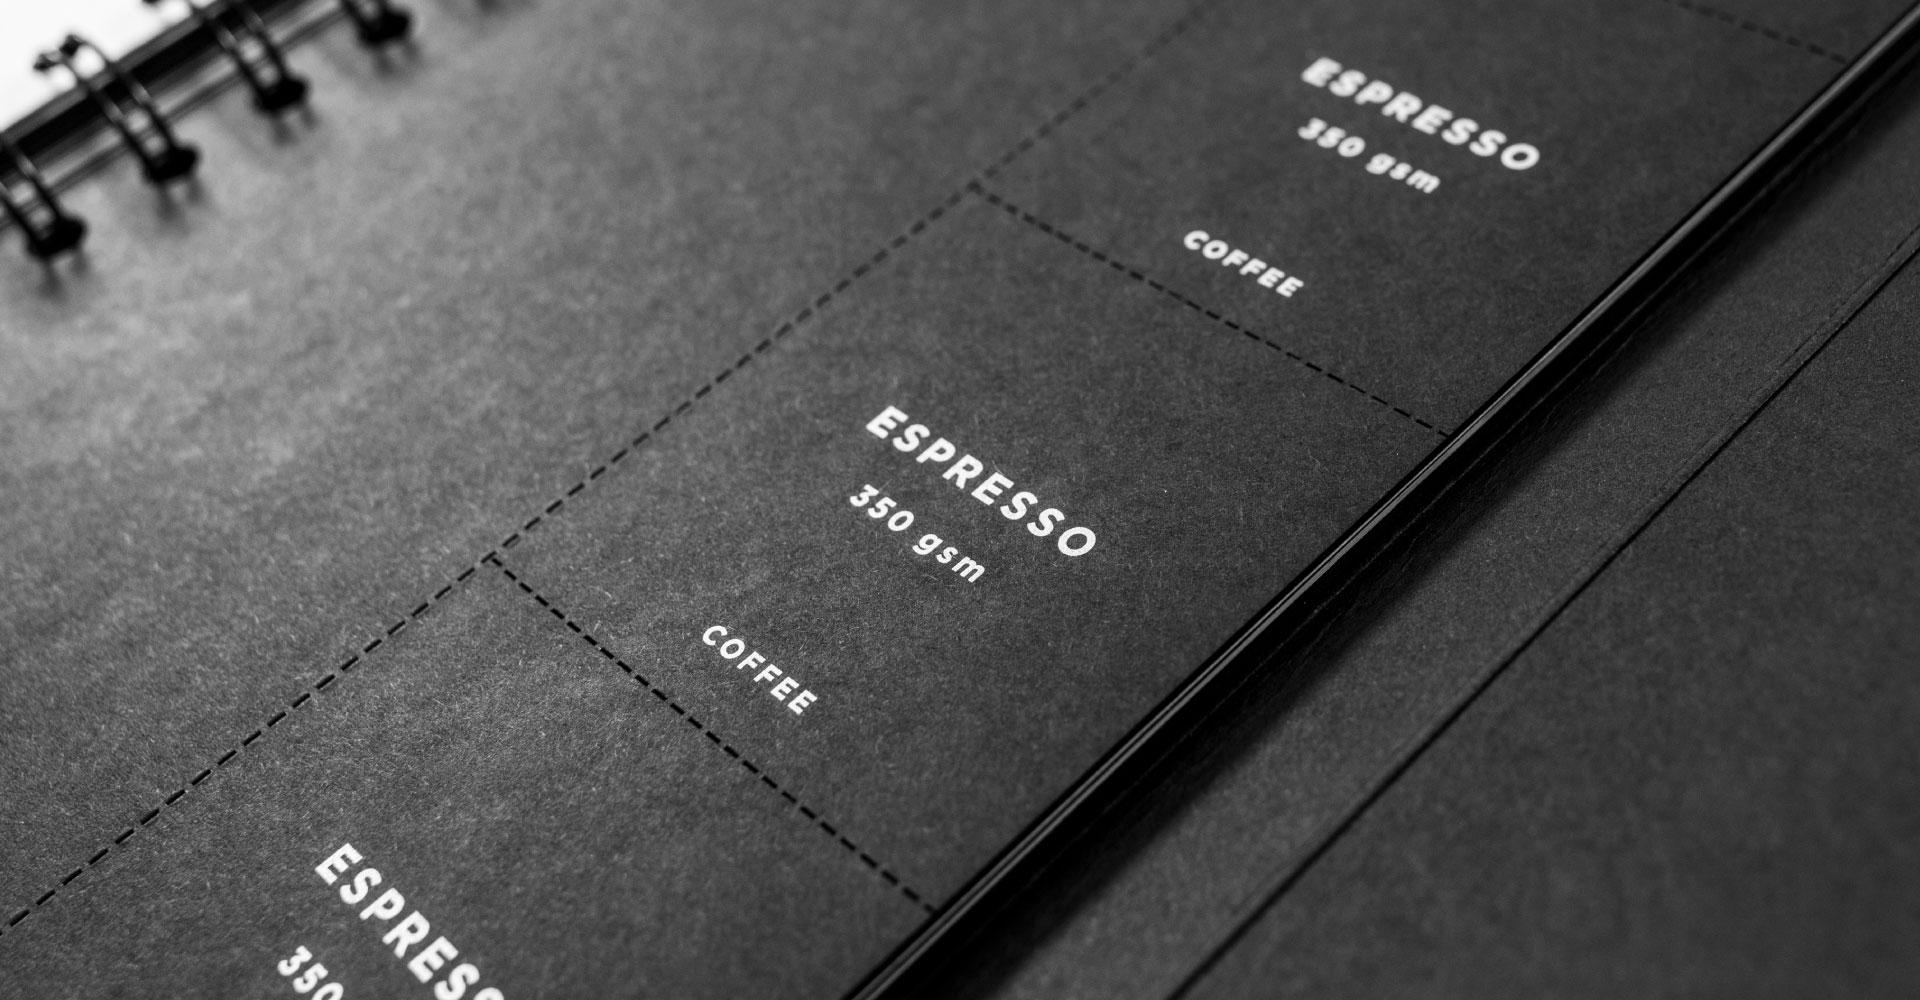 Plain Creative Project - Black Swatch Book - 7